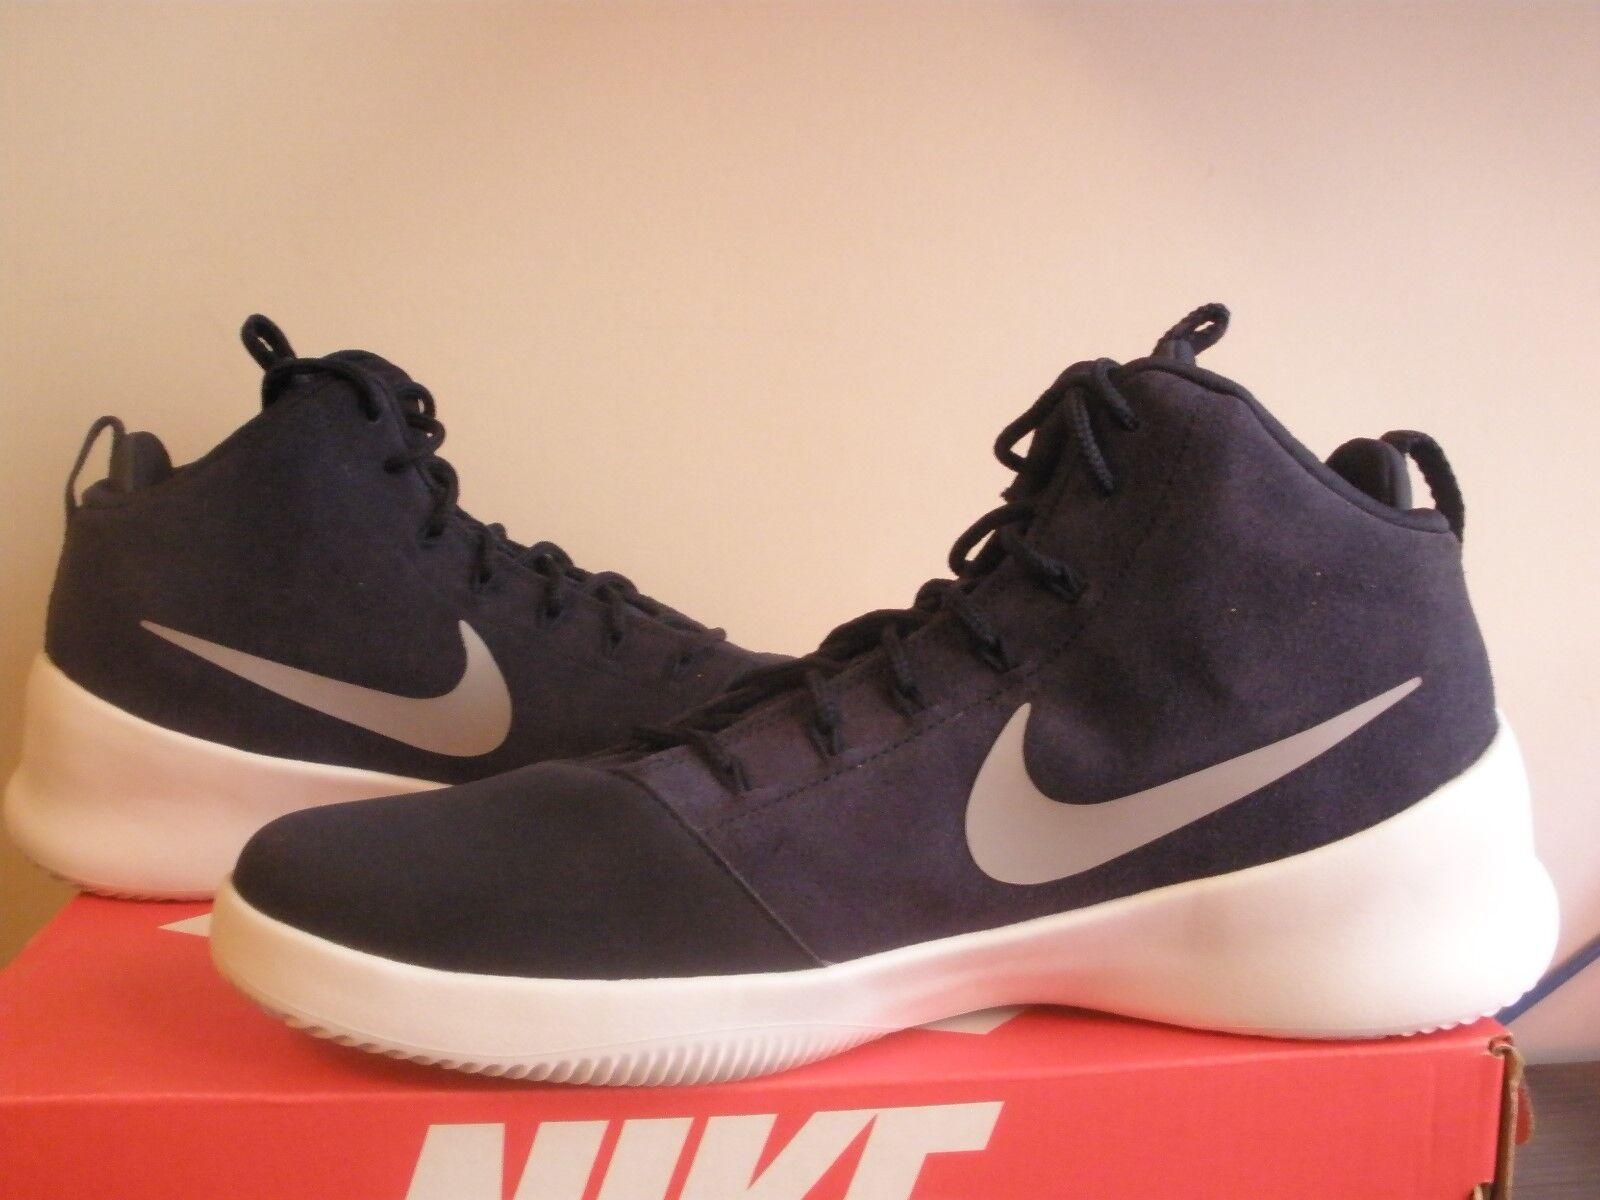 ff0def35cc4052 ... Nike Hyperfr3sh Hyperfresh PRM PRM PRM Premium US 11 UK 10 EU 45 697520  ...